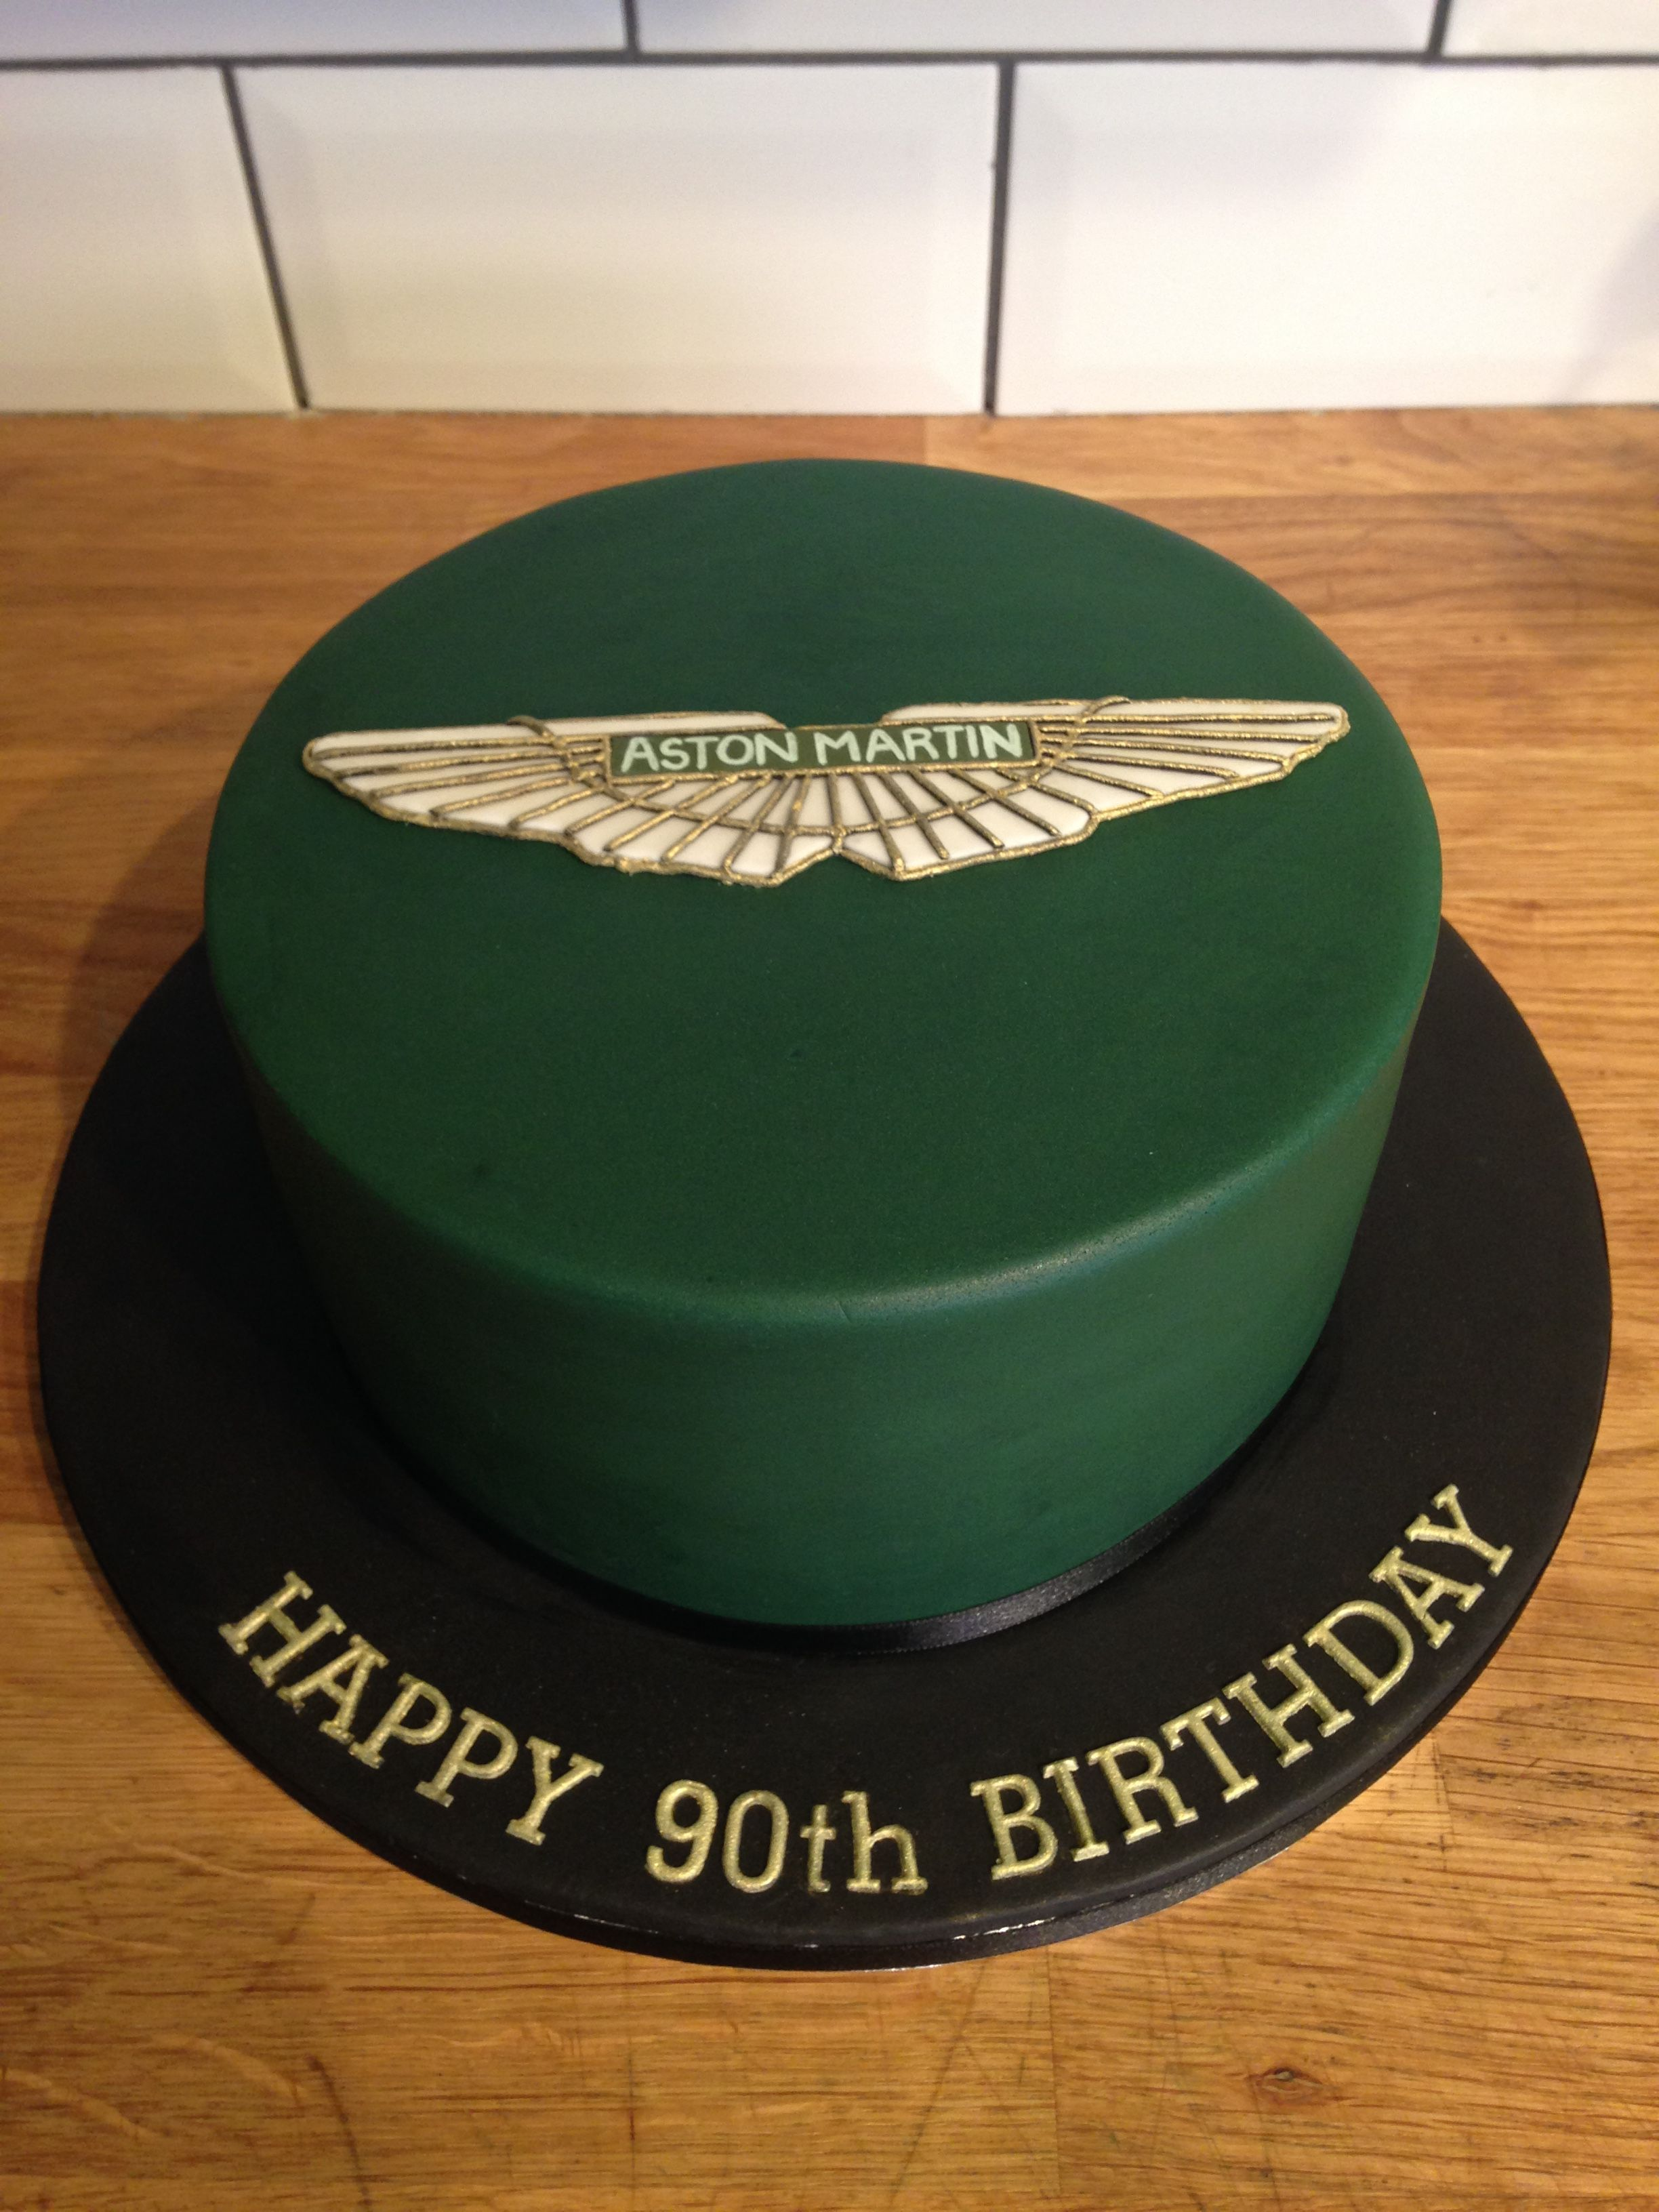 Aston Martin Cake My Cakes Pinterest Cake Cake Creations And